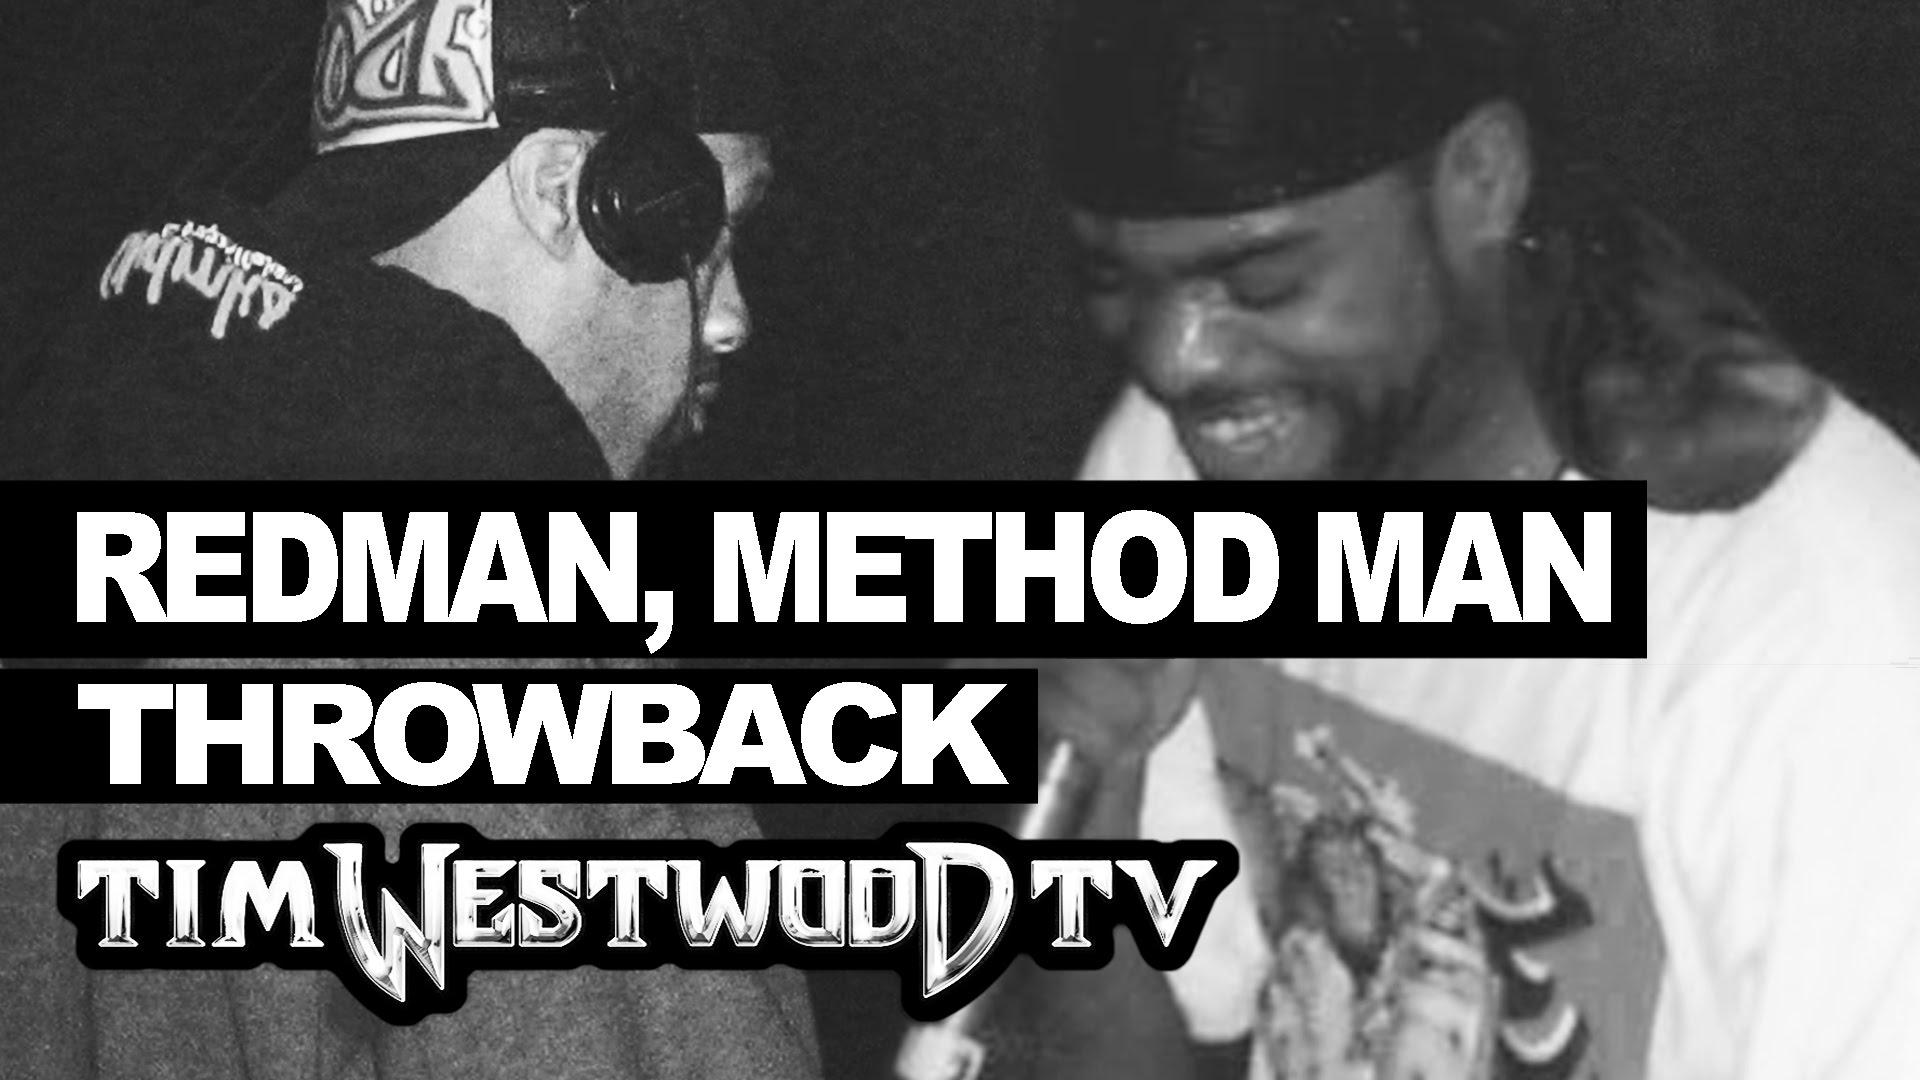 BARS: Redman, Method Man freestyle 1995 never heard before throwback – Westwood